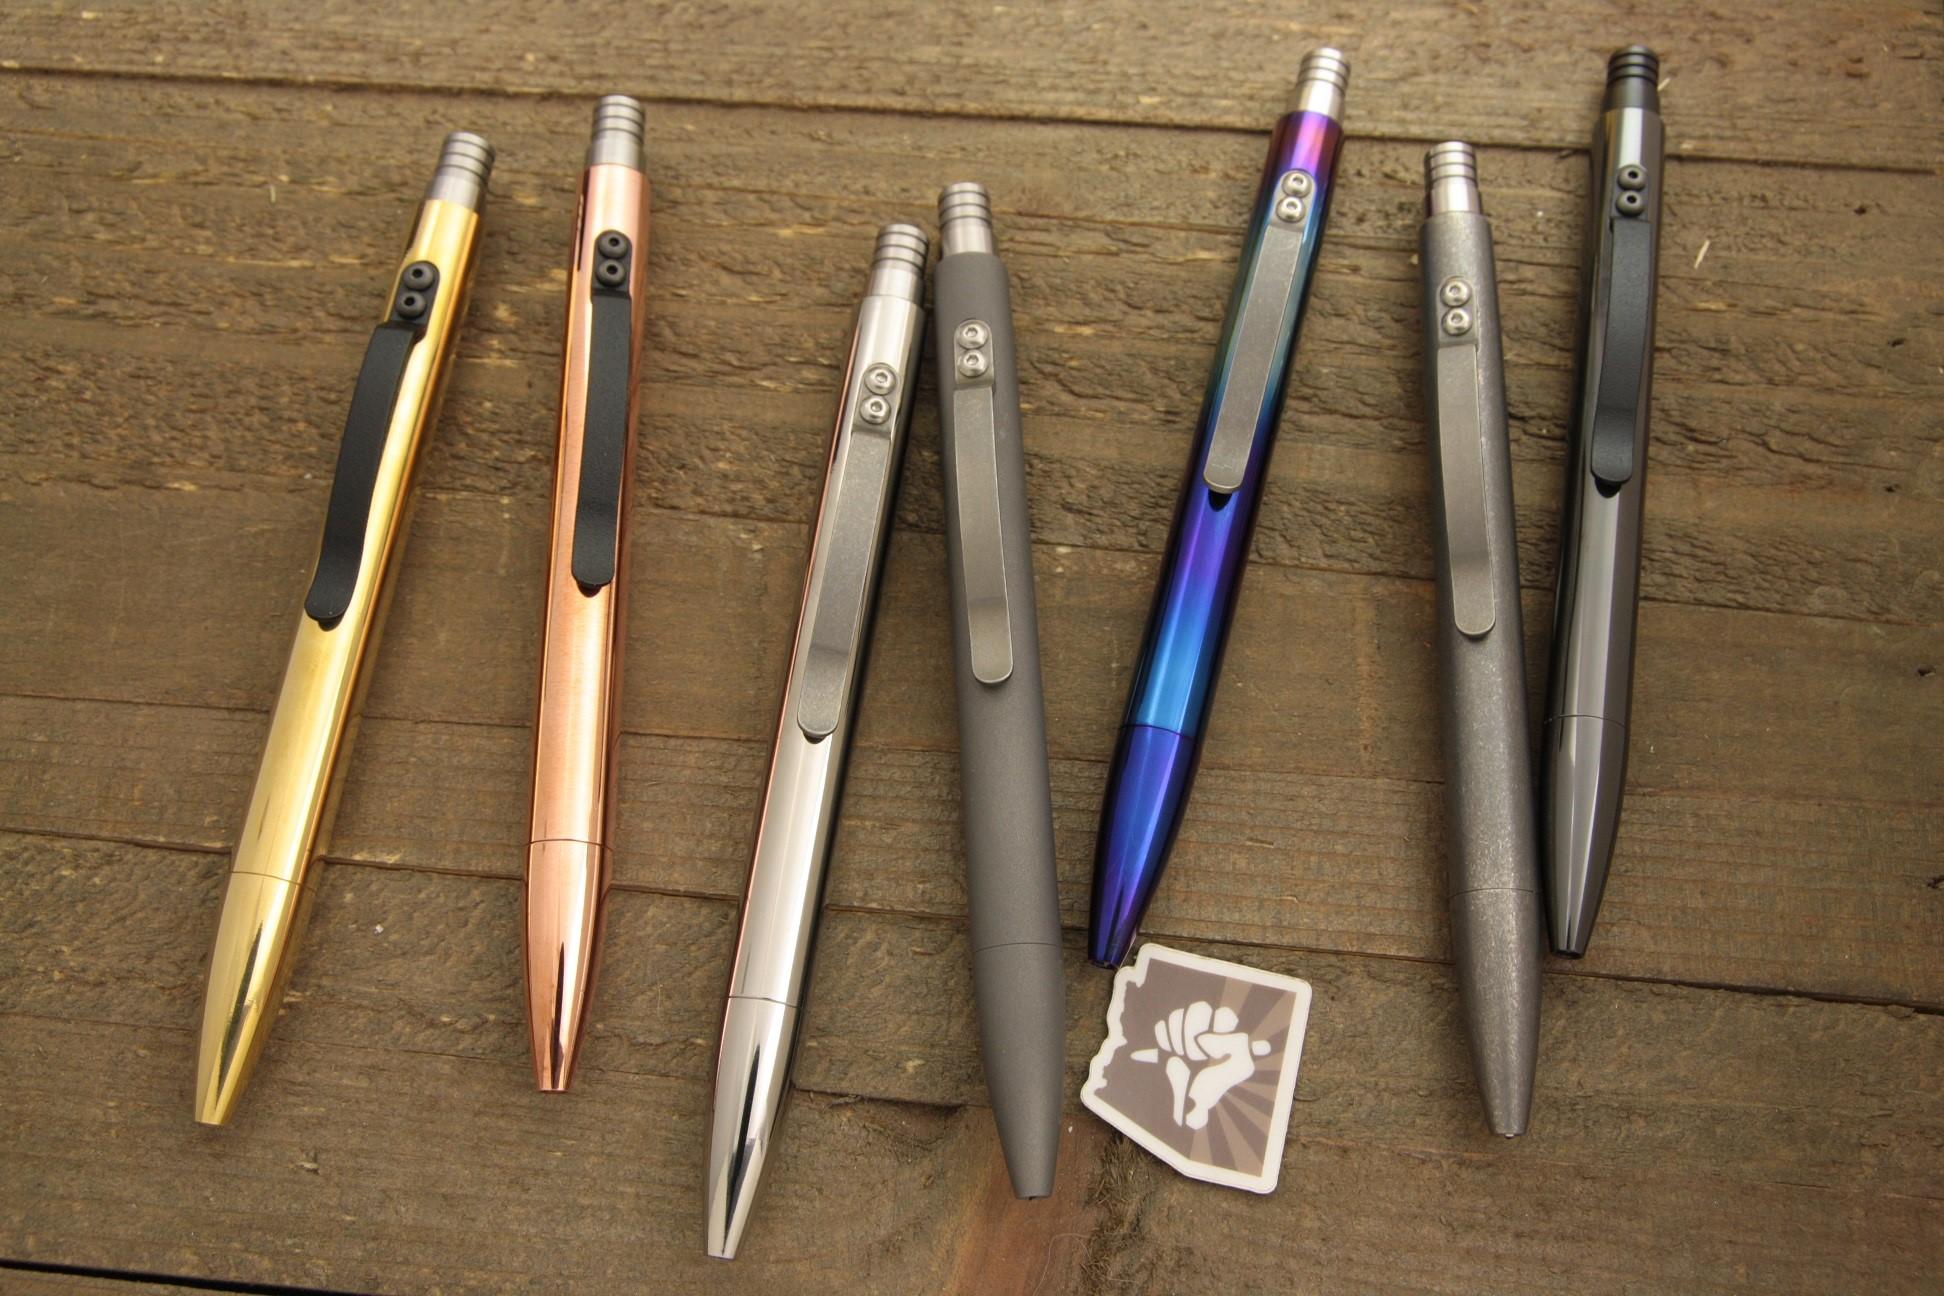 Tuff-Writer™ Launches New Retro-Click Executive Pen on Kickstarter